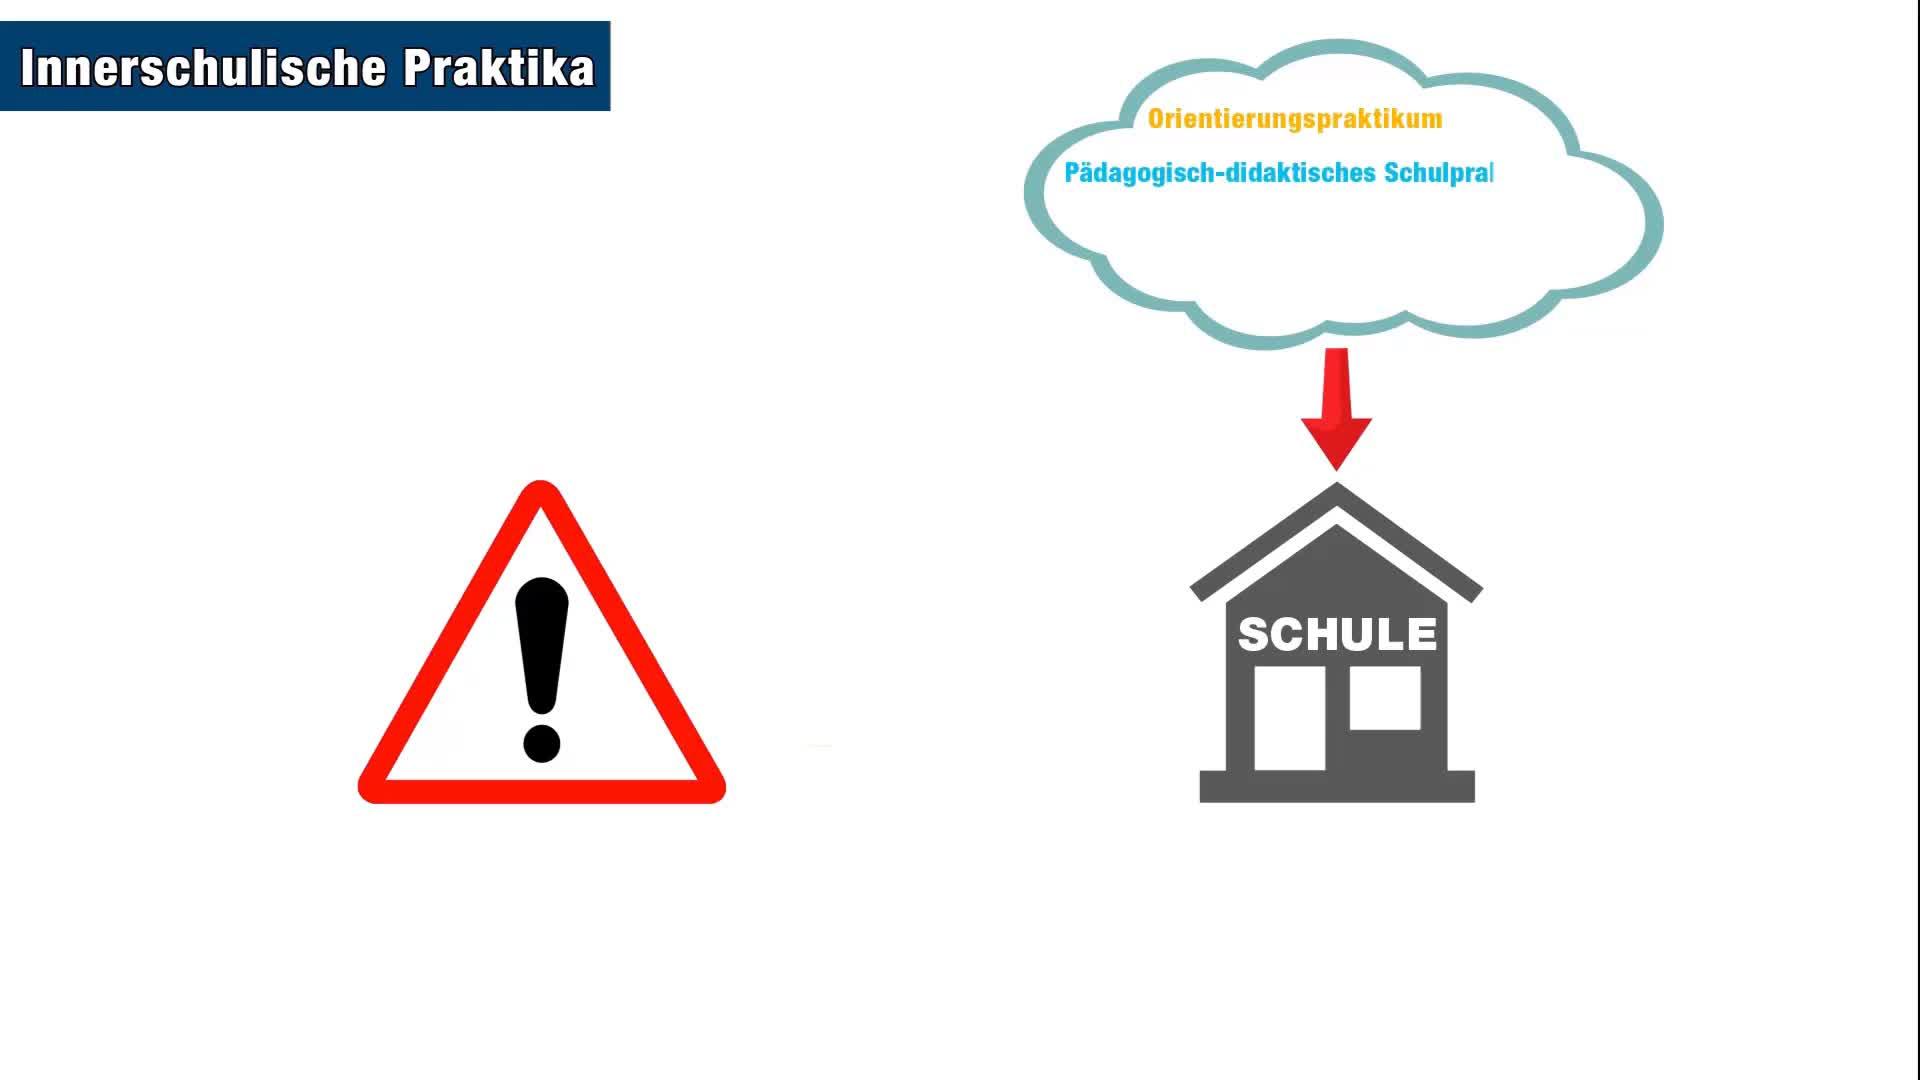 Lehramt | Gymnasium | Realschule | Praktika | Schule | ZfL preview image